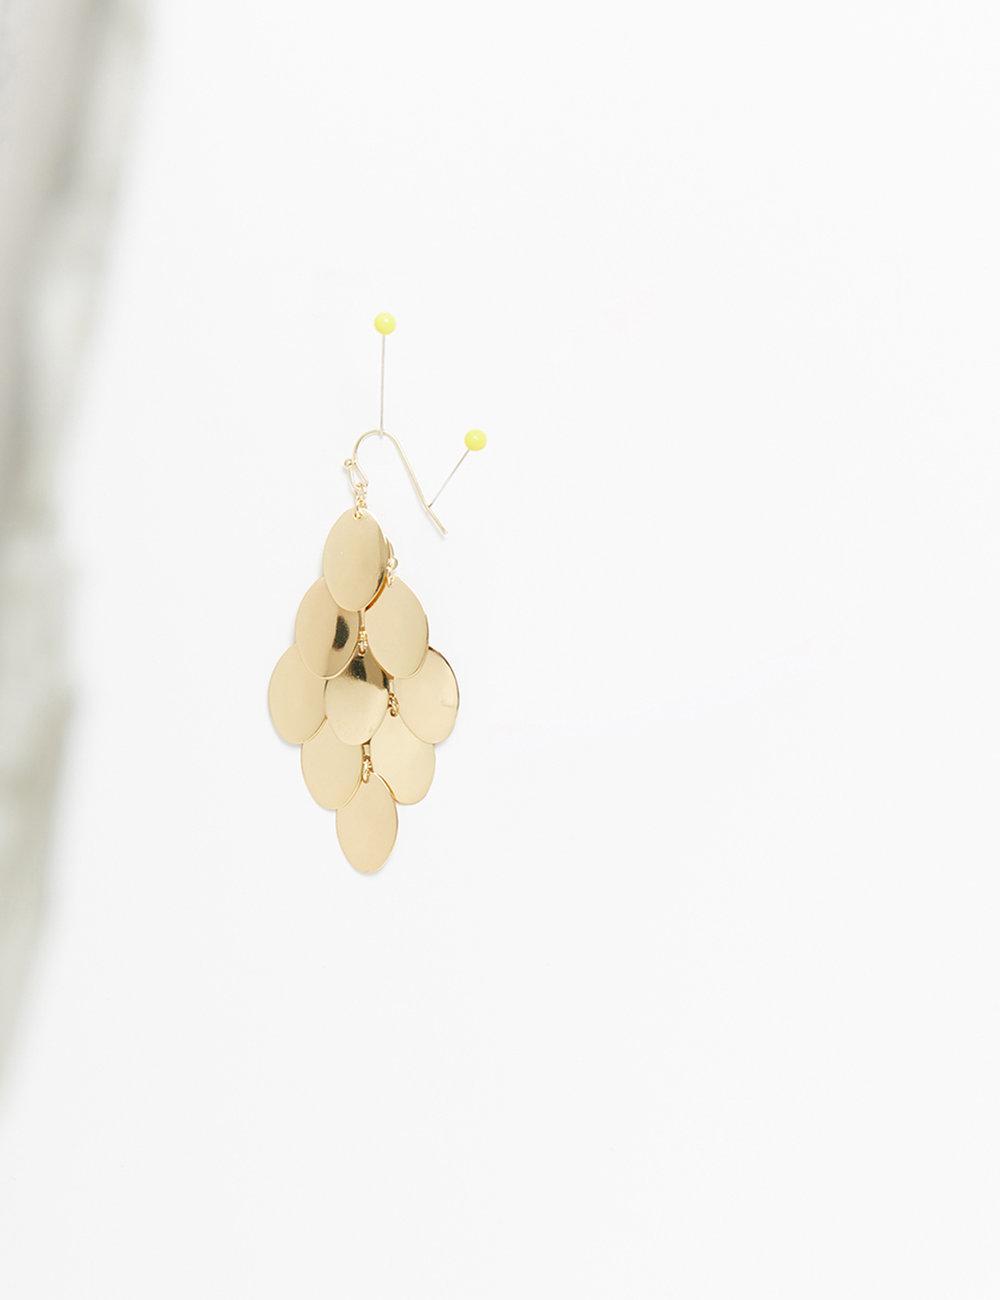 single gold disk chandelier earring on white background.